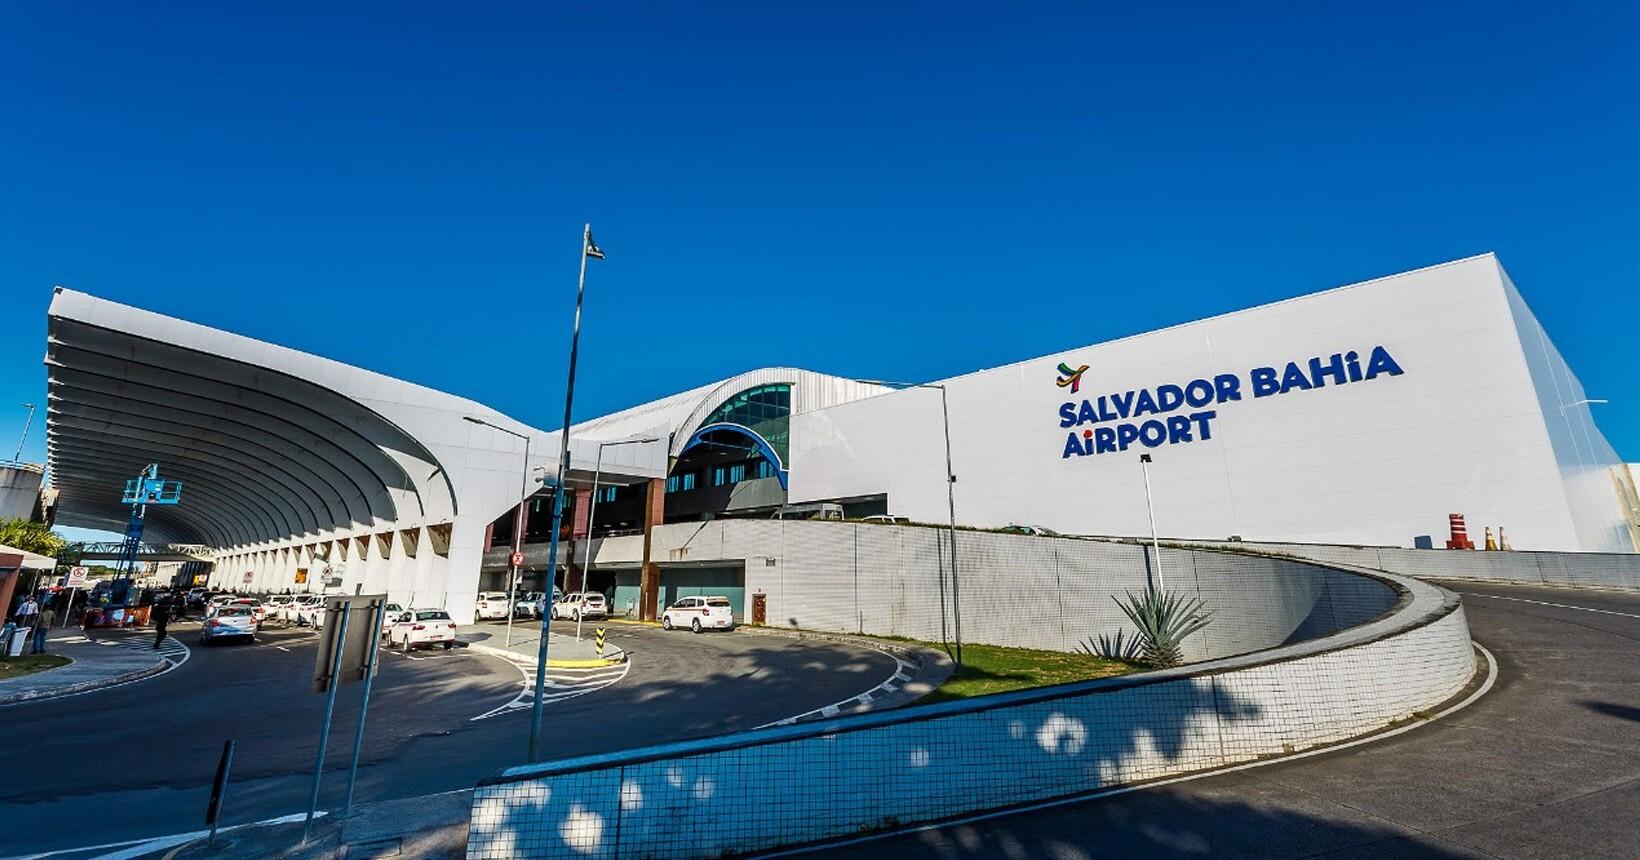 Aeroporto de Salvador (SSA) - guia completo para viajantes!